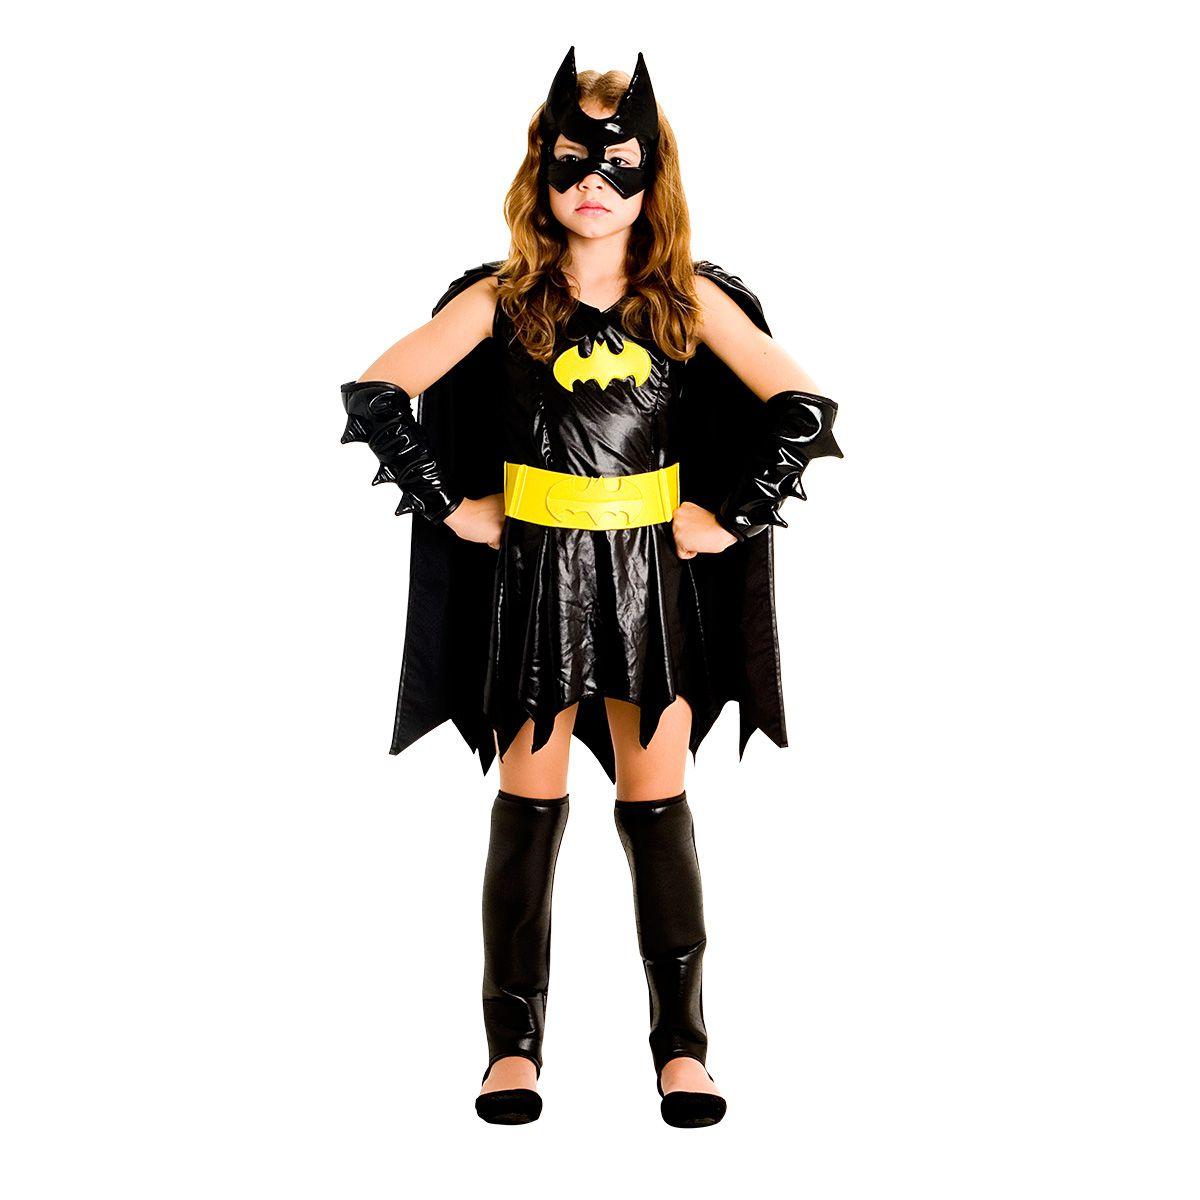 Fantasia Batgirl Infantil Luxo